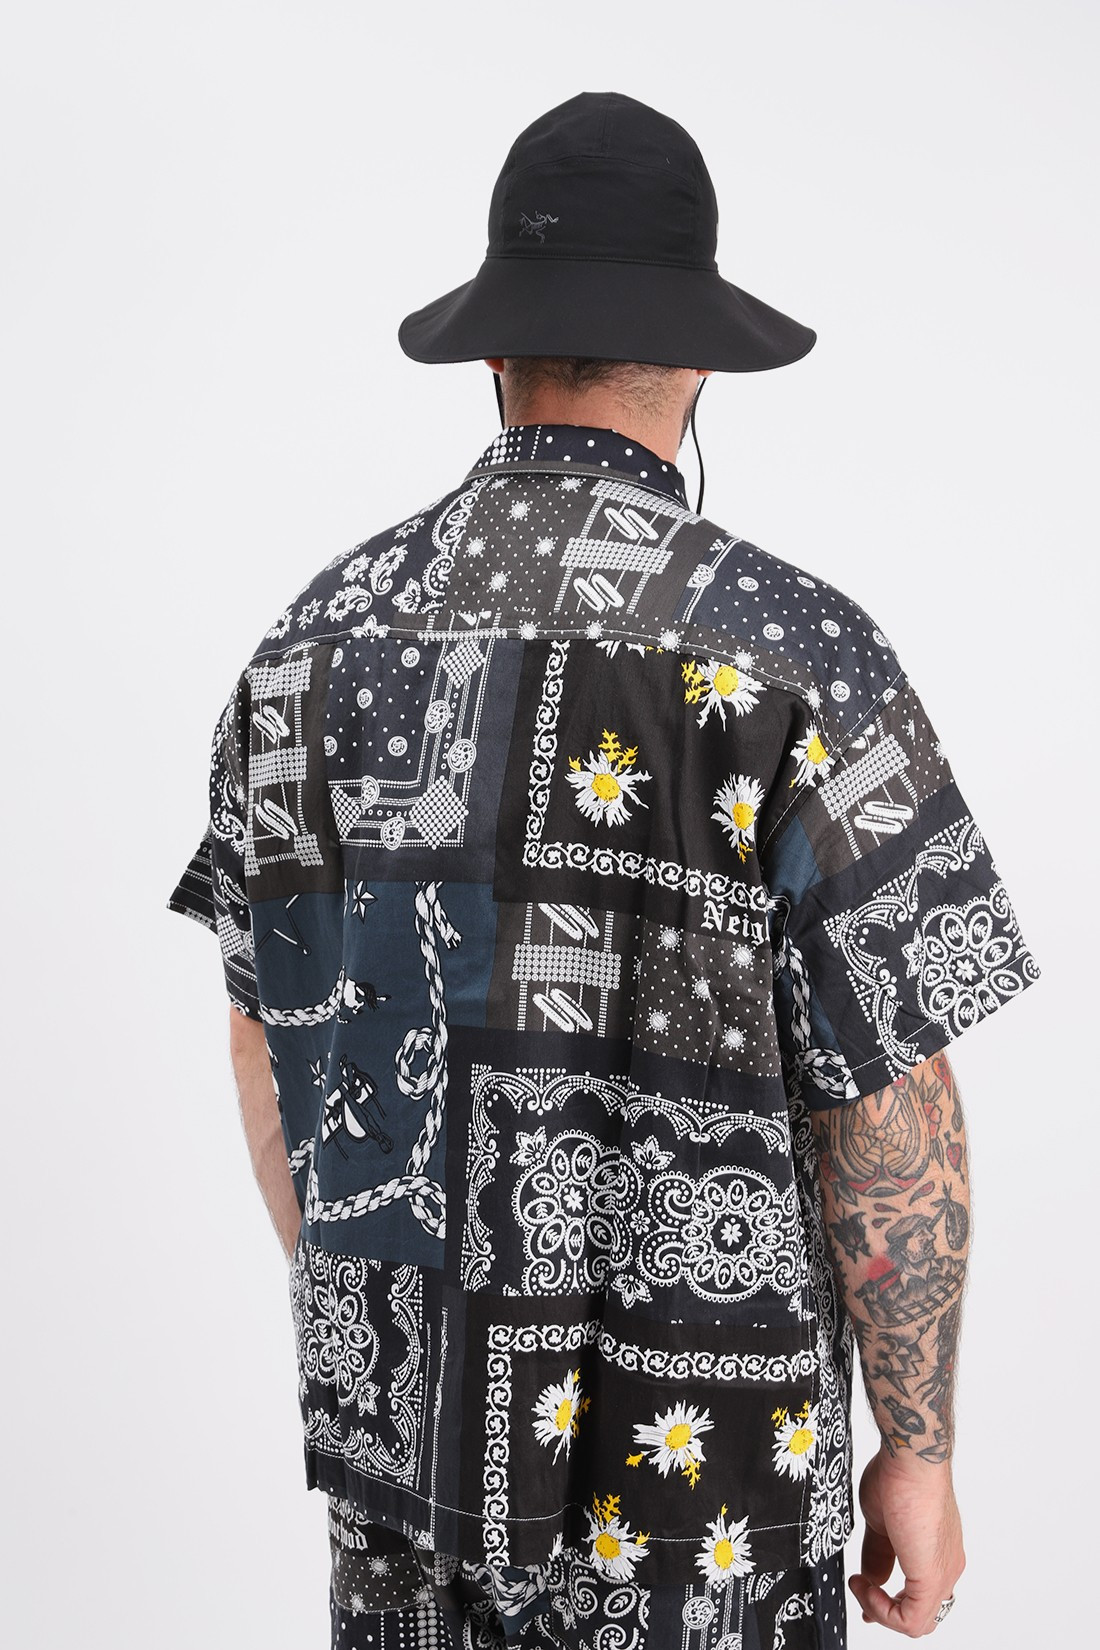 NEIGHBORHOOD / Bandana type-b / c-shirt . ss Black